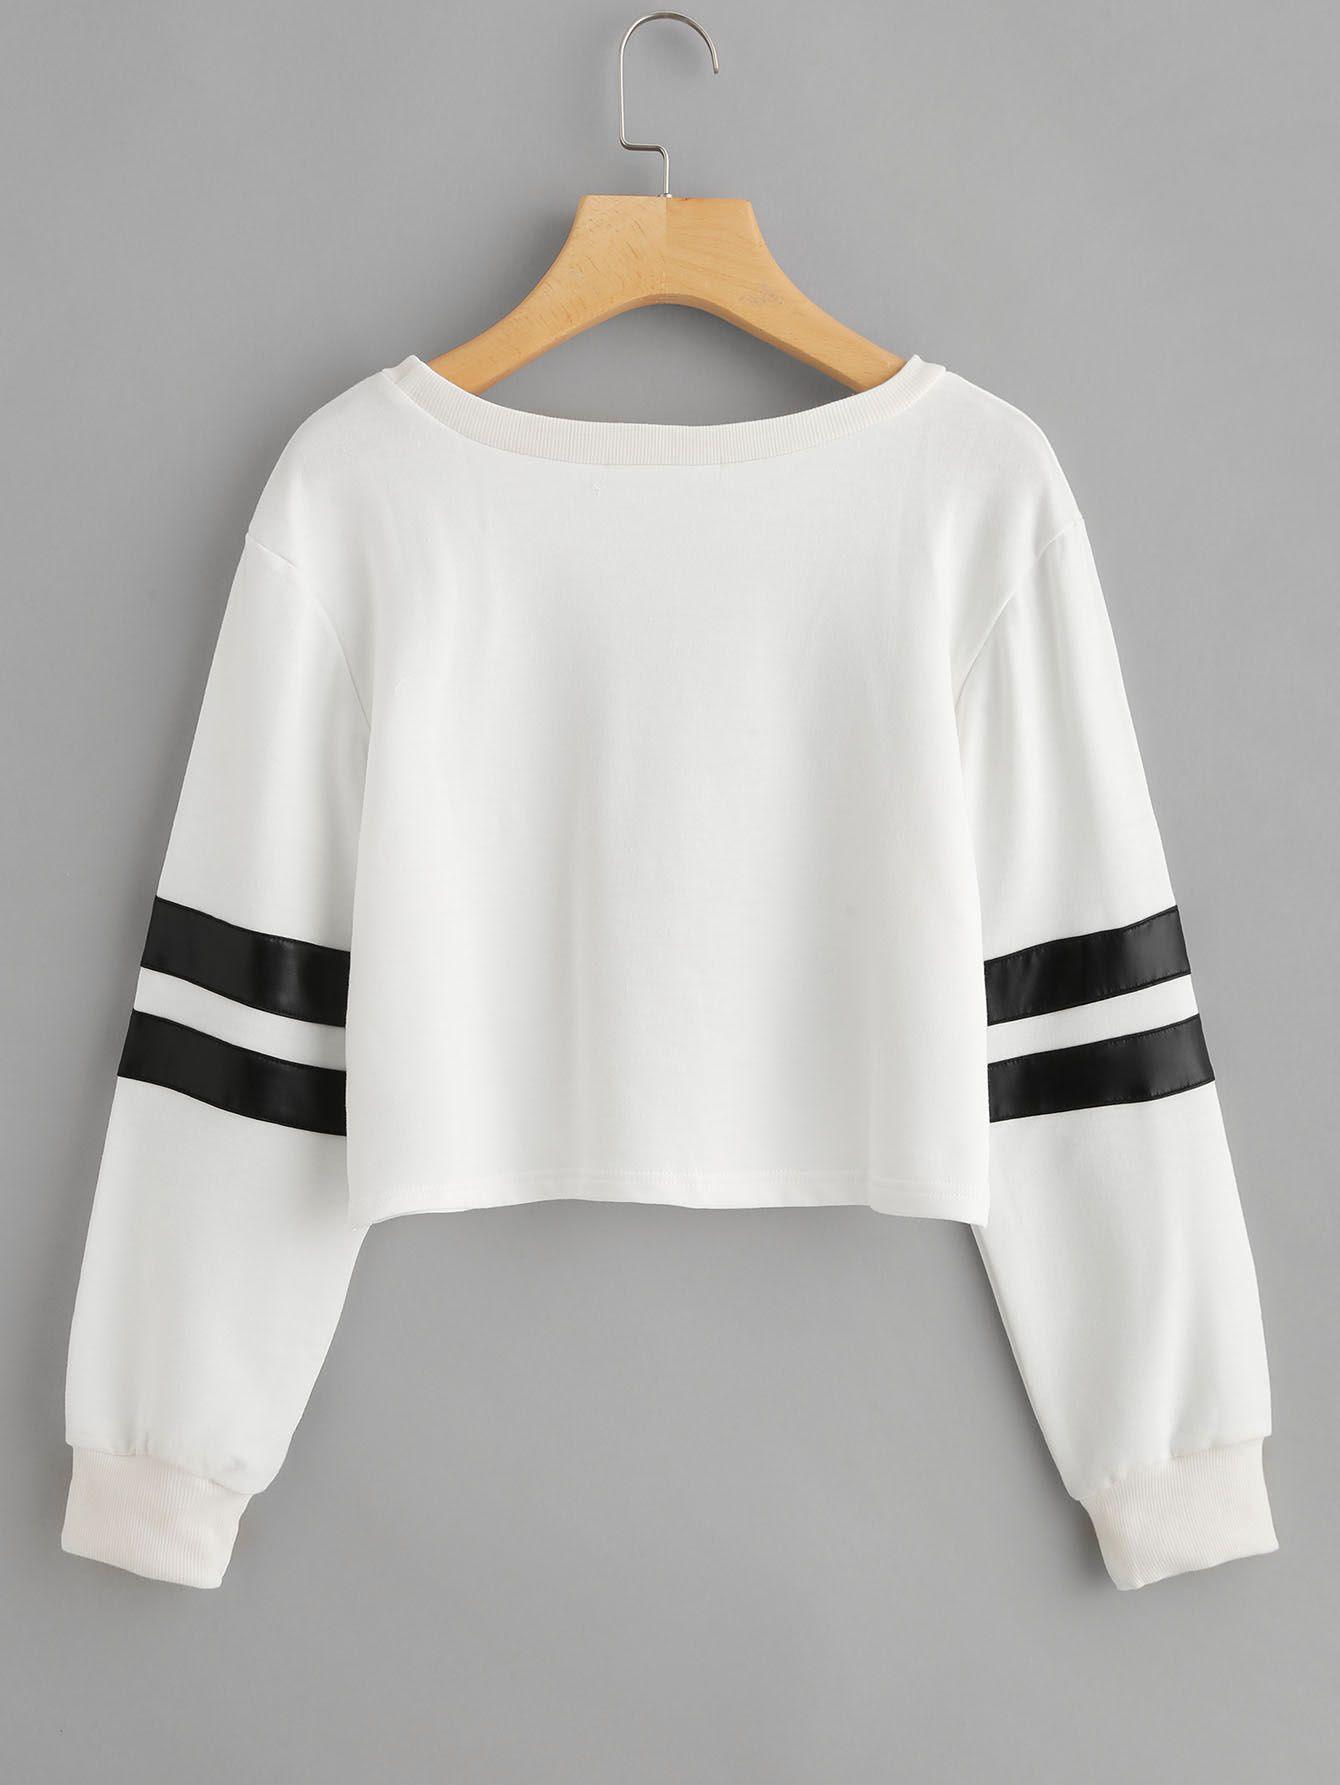 8cac5c726b Varsity Striped Crop Sweatshirt -SheIn(Sheinside) | Varsity Striped ...